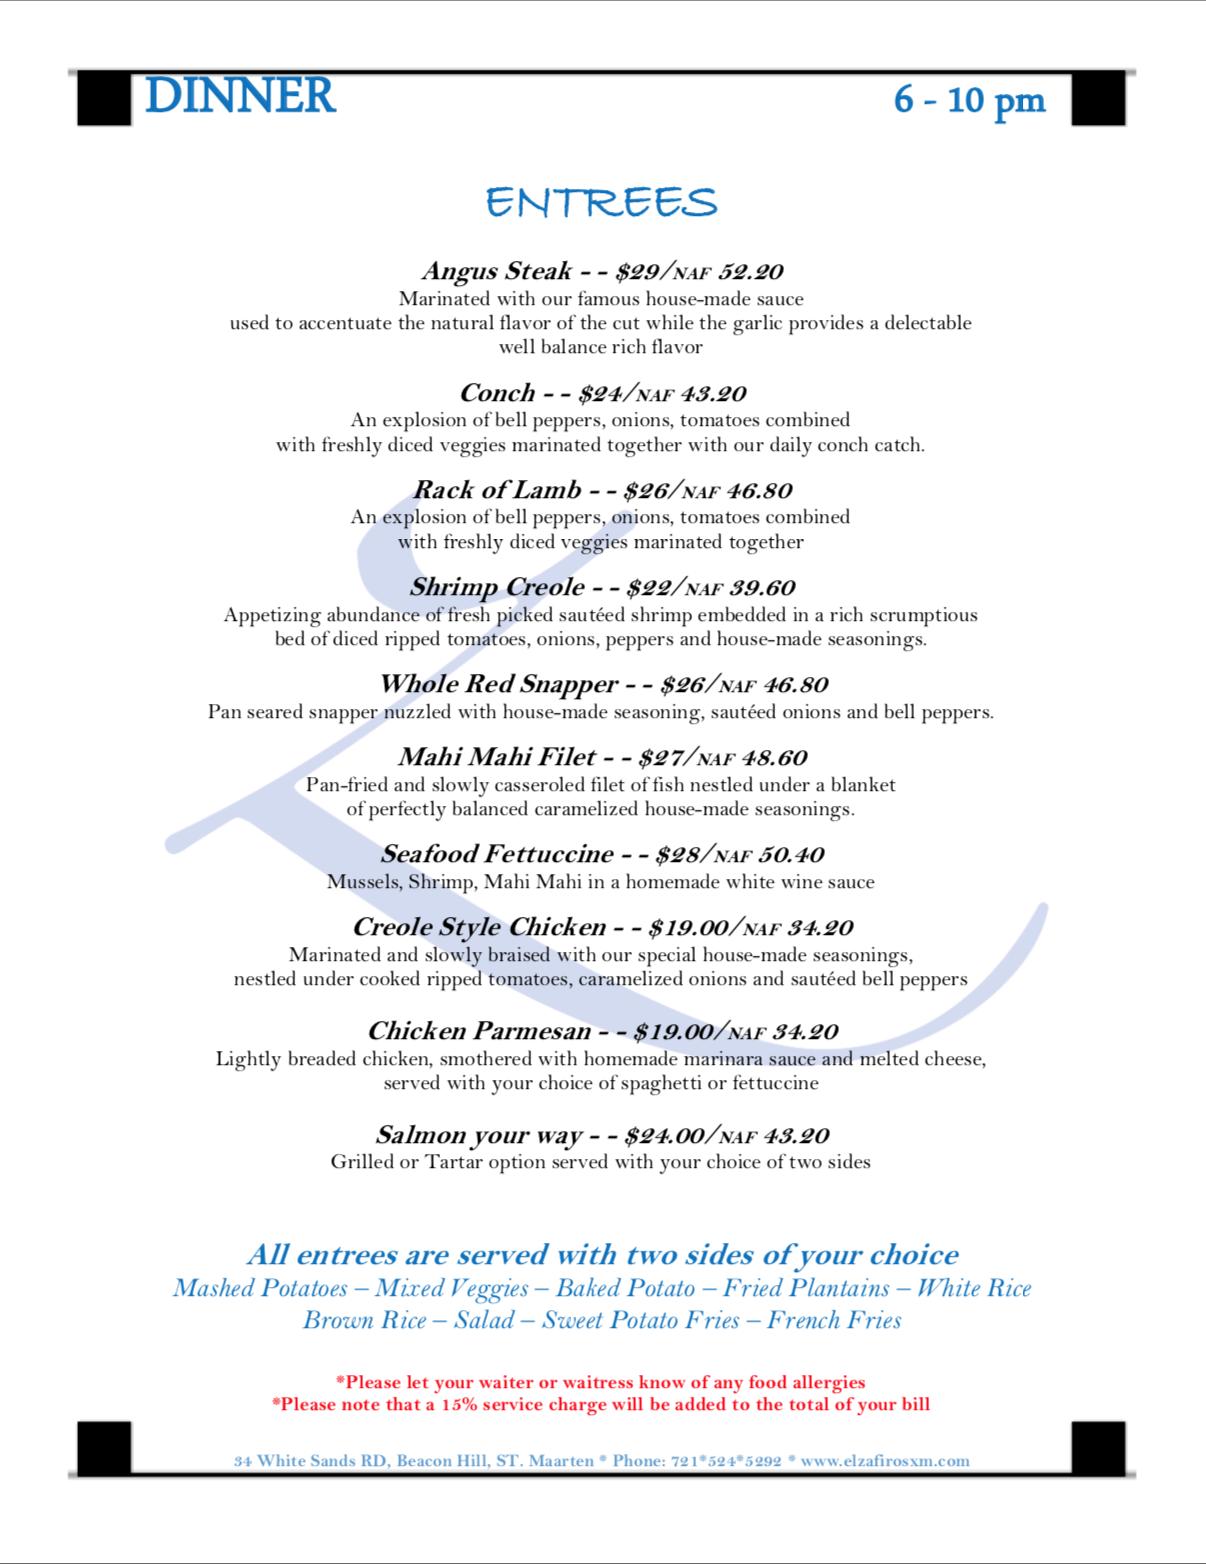 click to view full Dinner menu